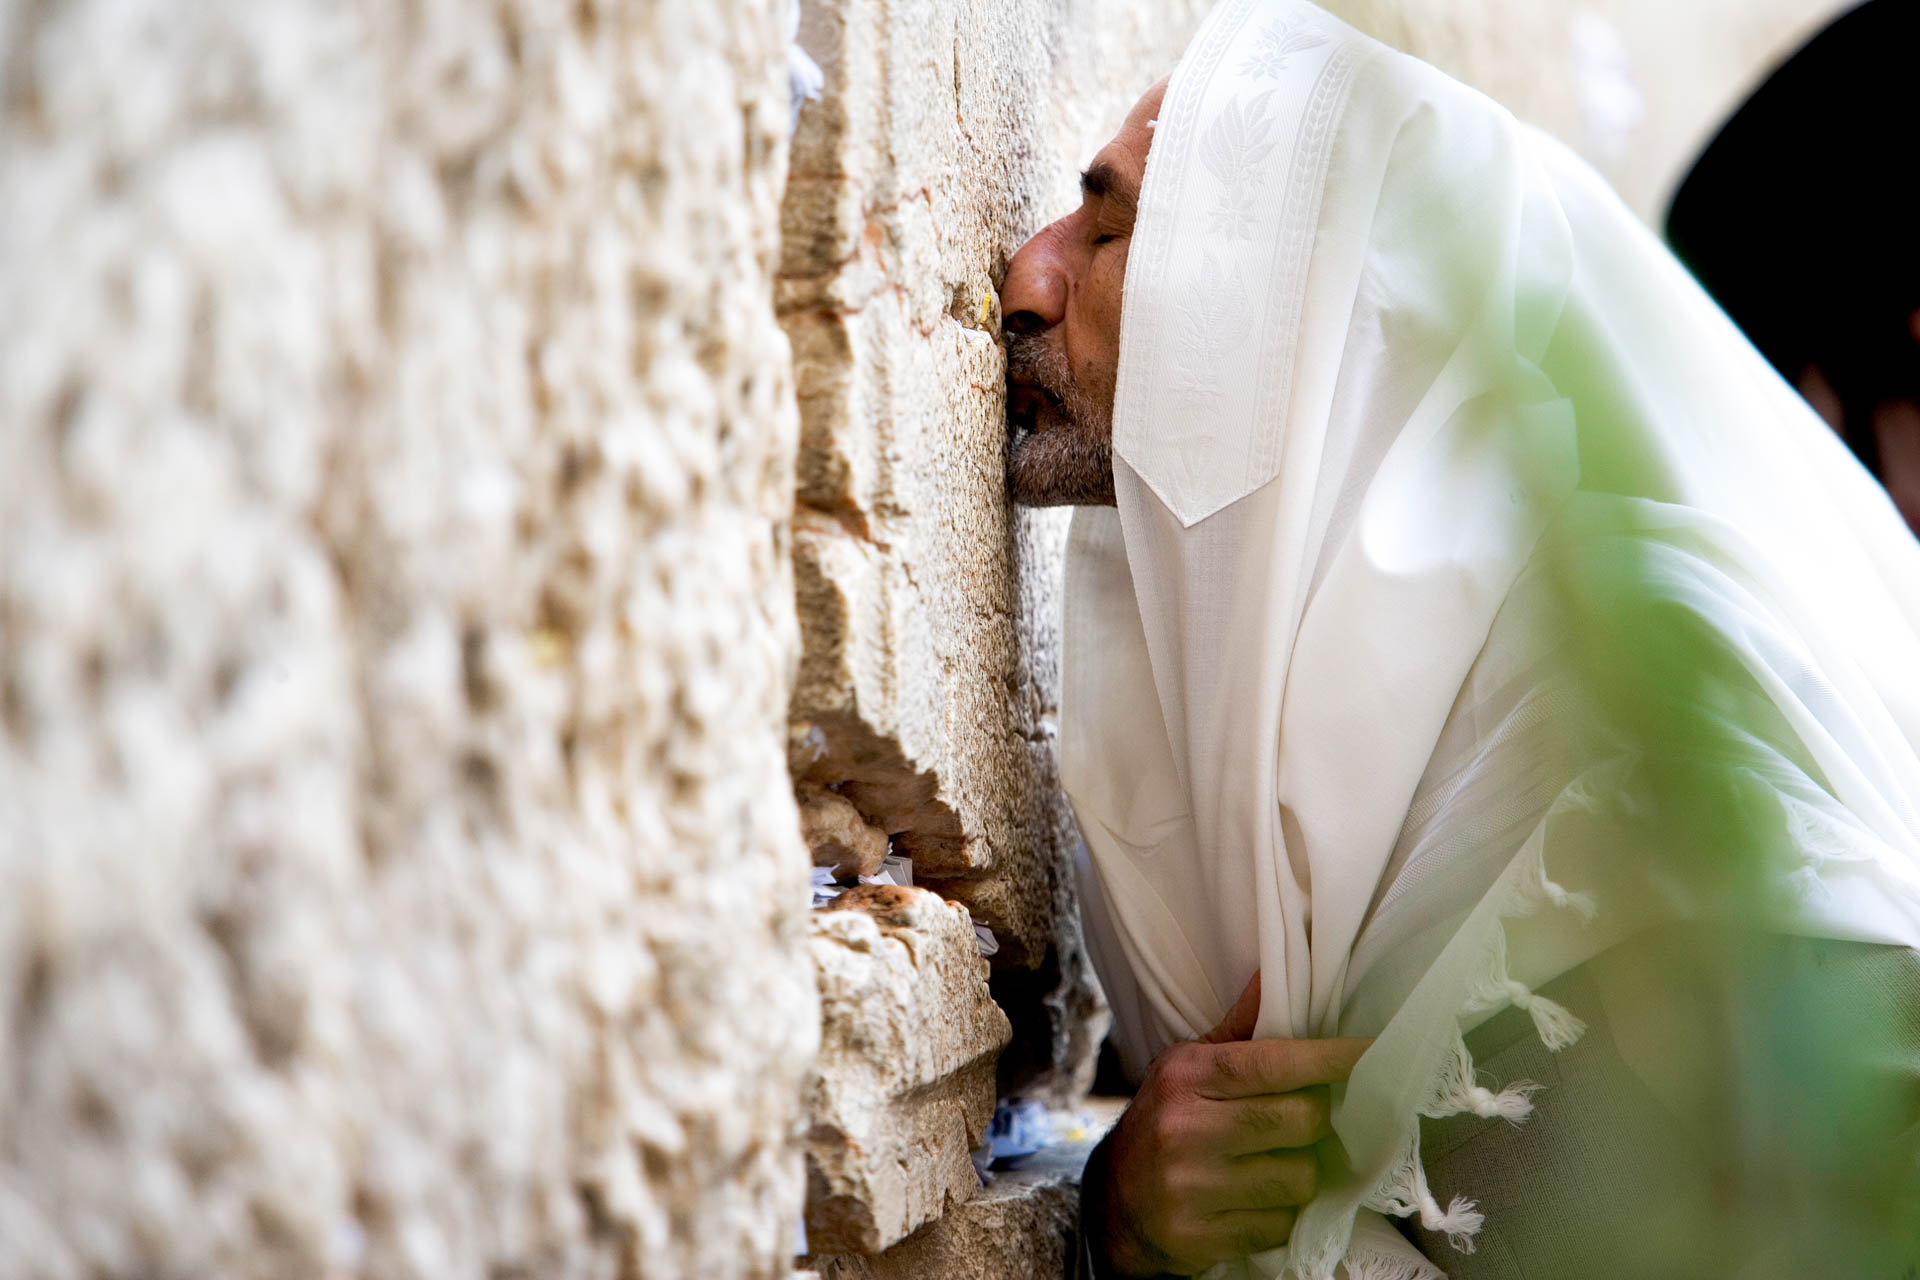 Jerusalem, Israel - 19 October 2005Jewish people pray at the Western Wall the starting day of Sukkoth.© GIANNI GIANSANTI